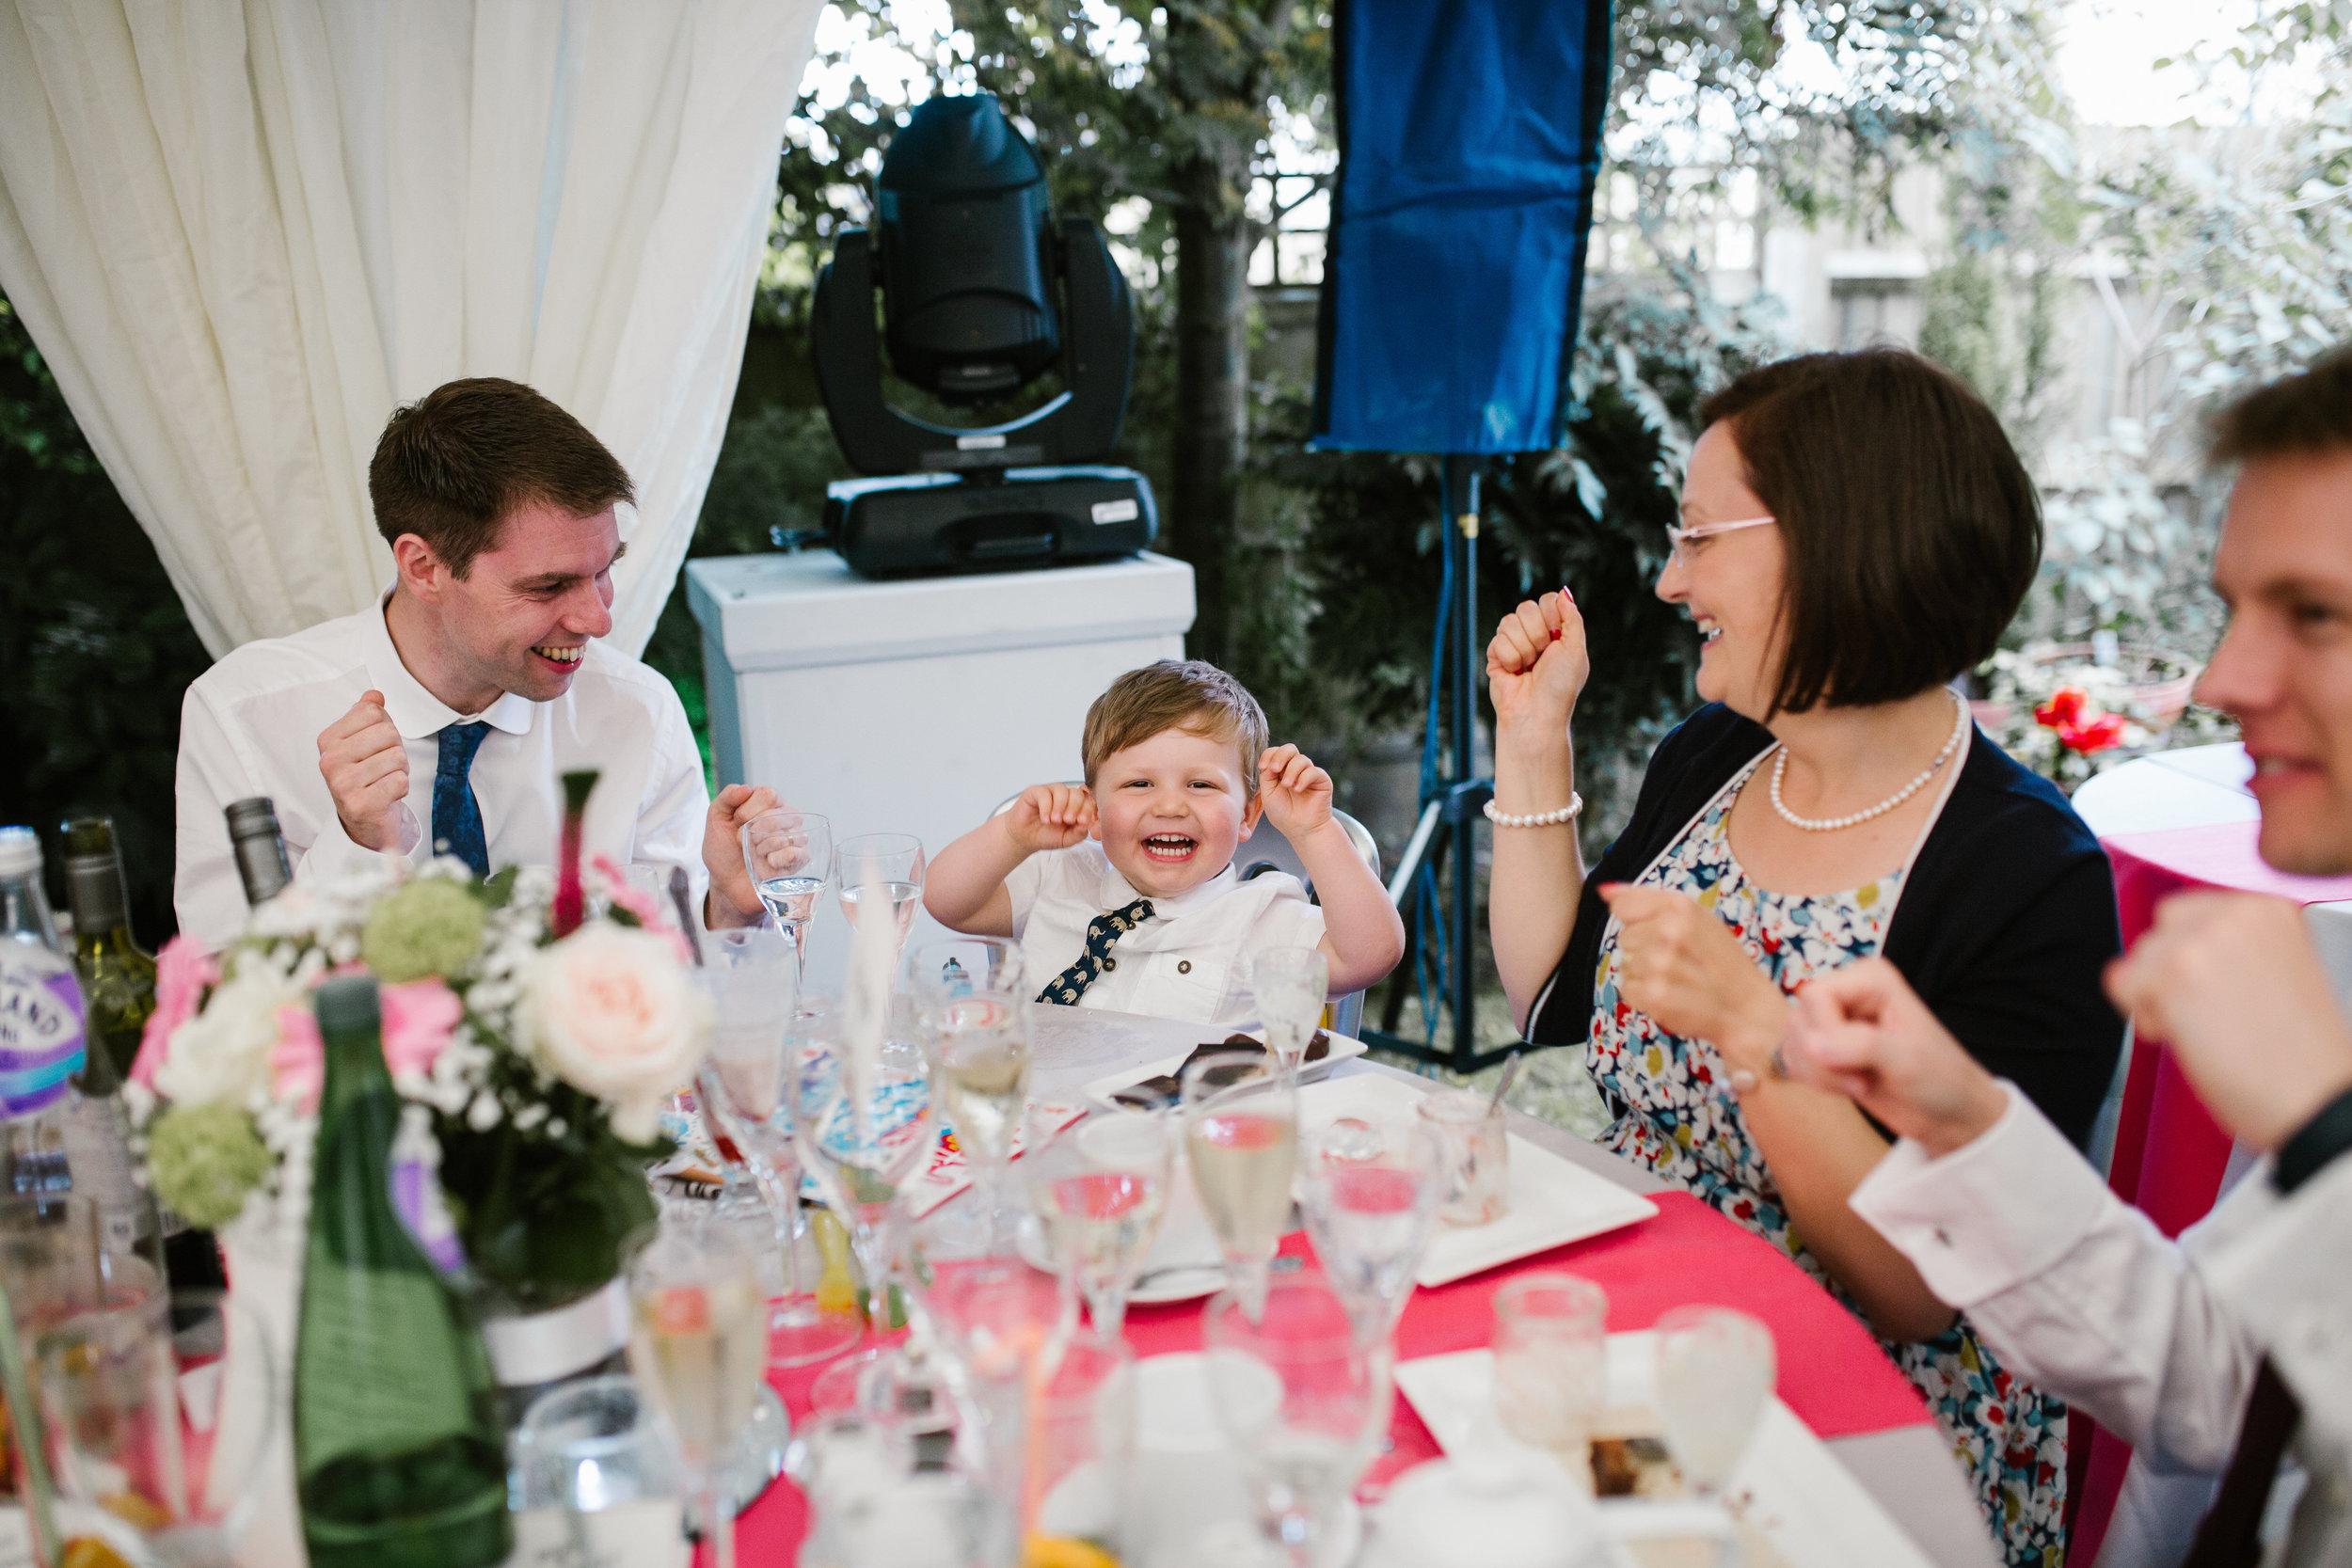 Sutton Coldfield wedding, Birmingham wedding photographer, Sutton Coldfield wedding photographer, marquee wedding, back garden wedding, DIY wedding-135.jpg